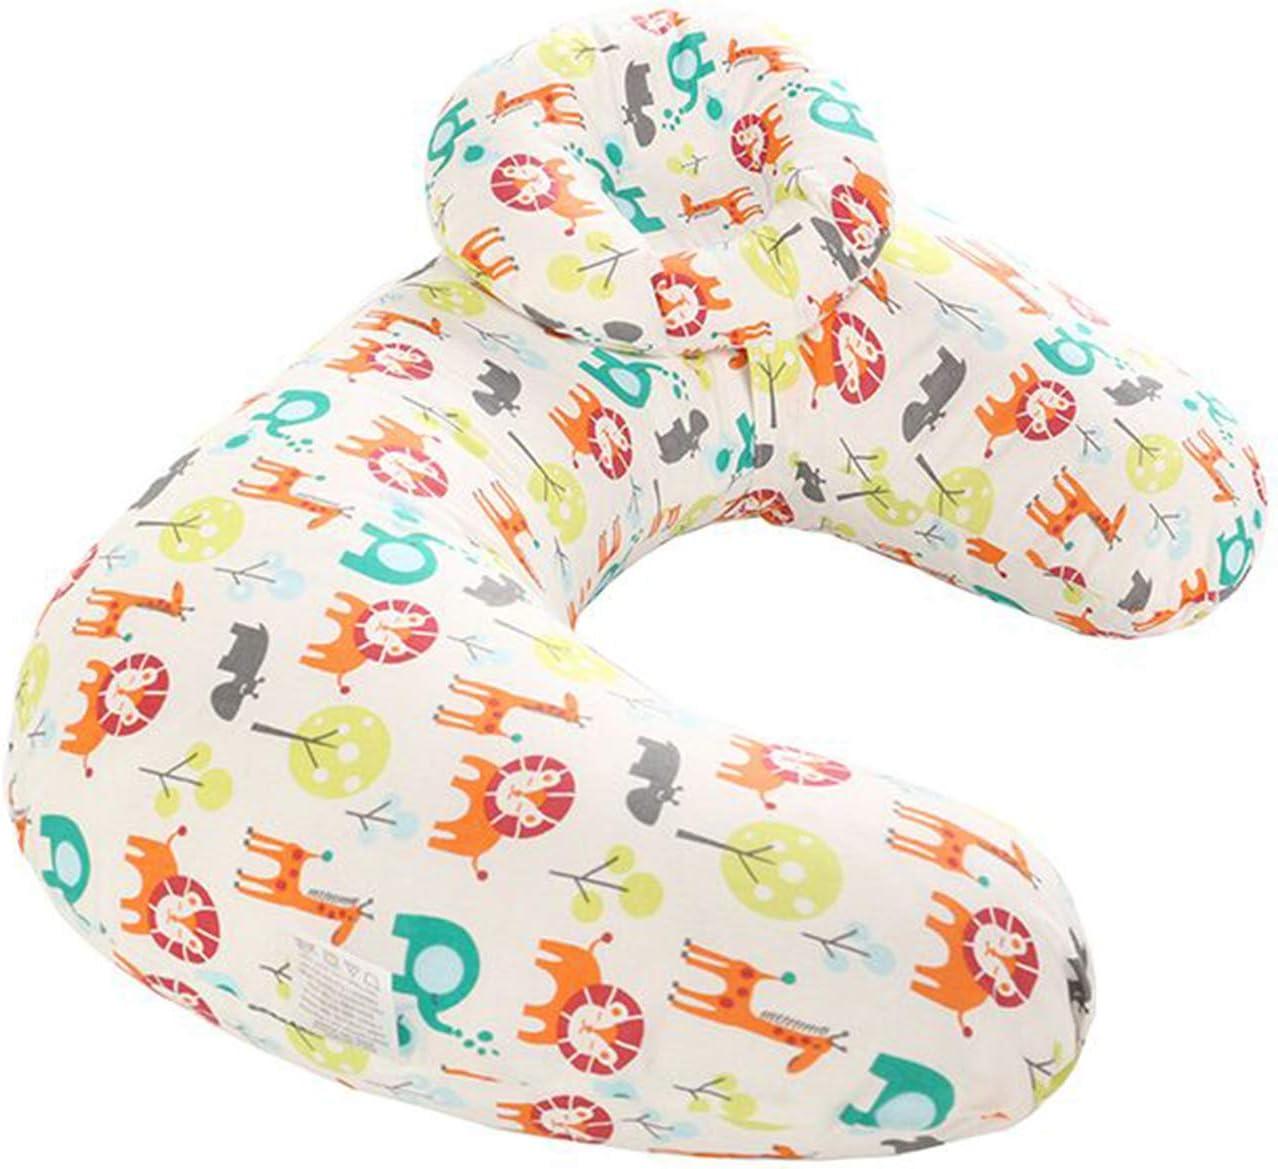 Enfermer/ía Almohada reci/én Nacido del ocioso Desmontable Apoyo de enfermer/ía Relleno de Maternidad Lactancia Materna Almohada